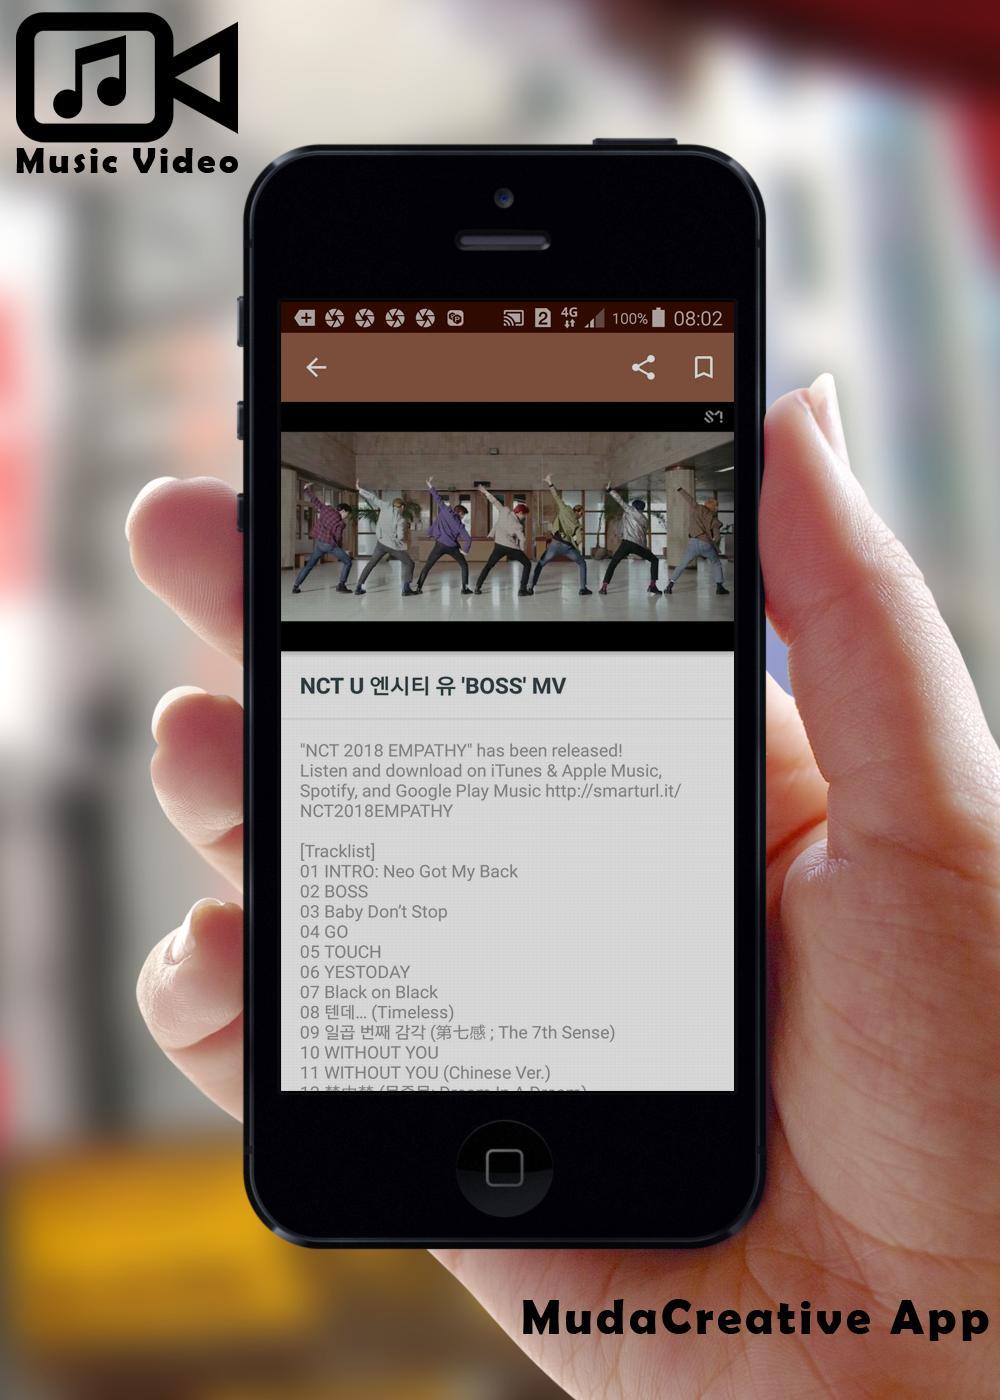 Google Play Music Tracklist 01 Intro - TropicalWeather